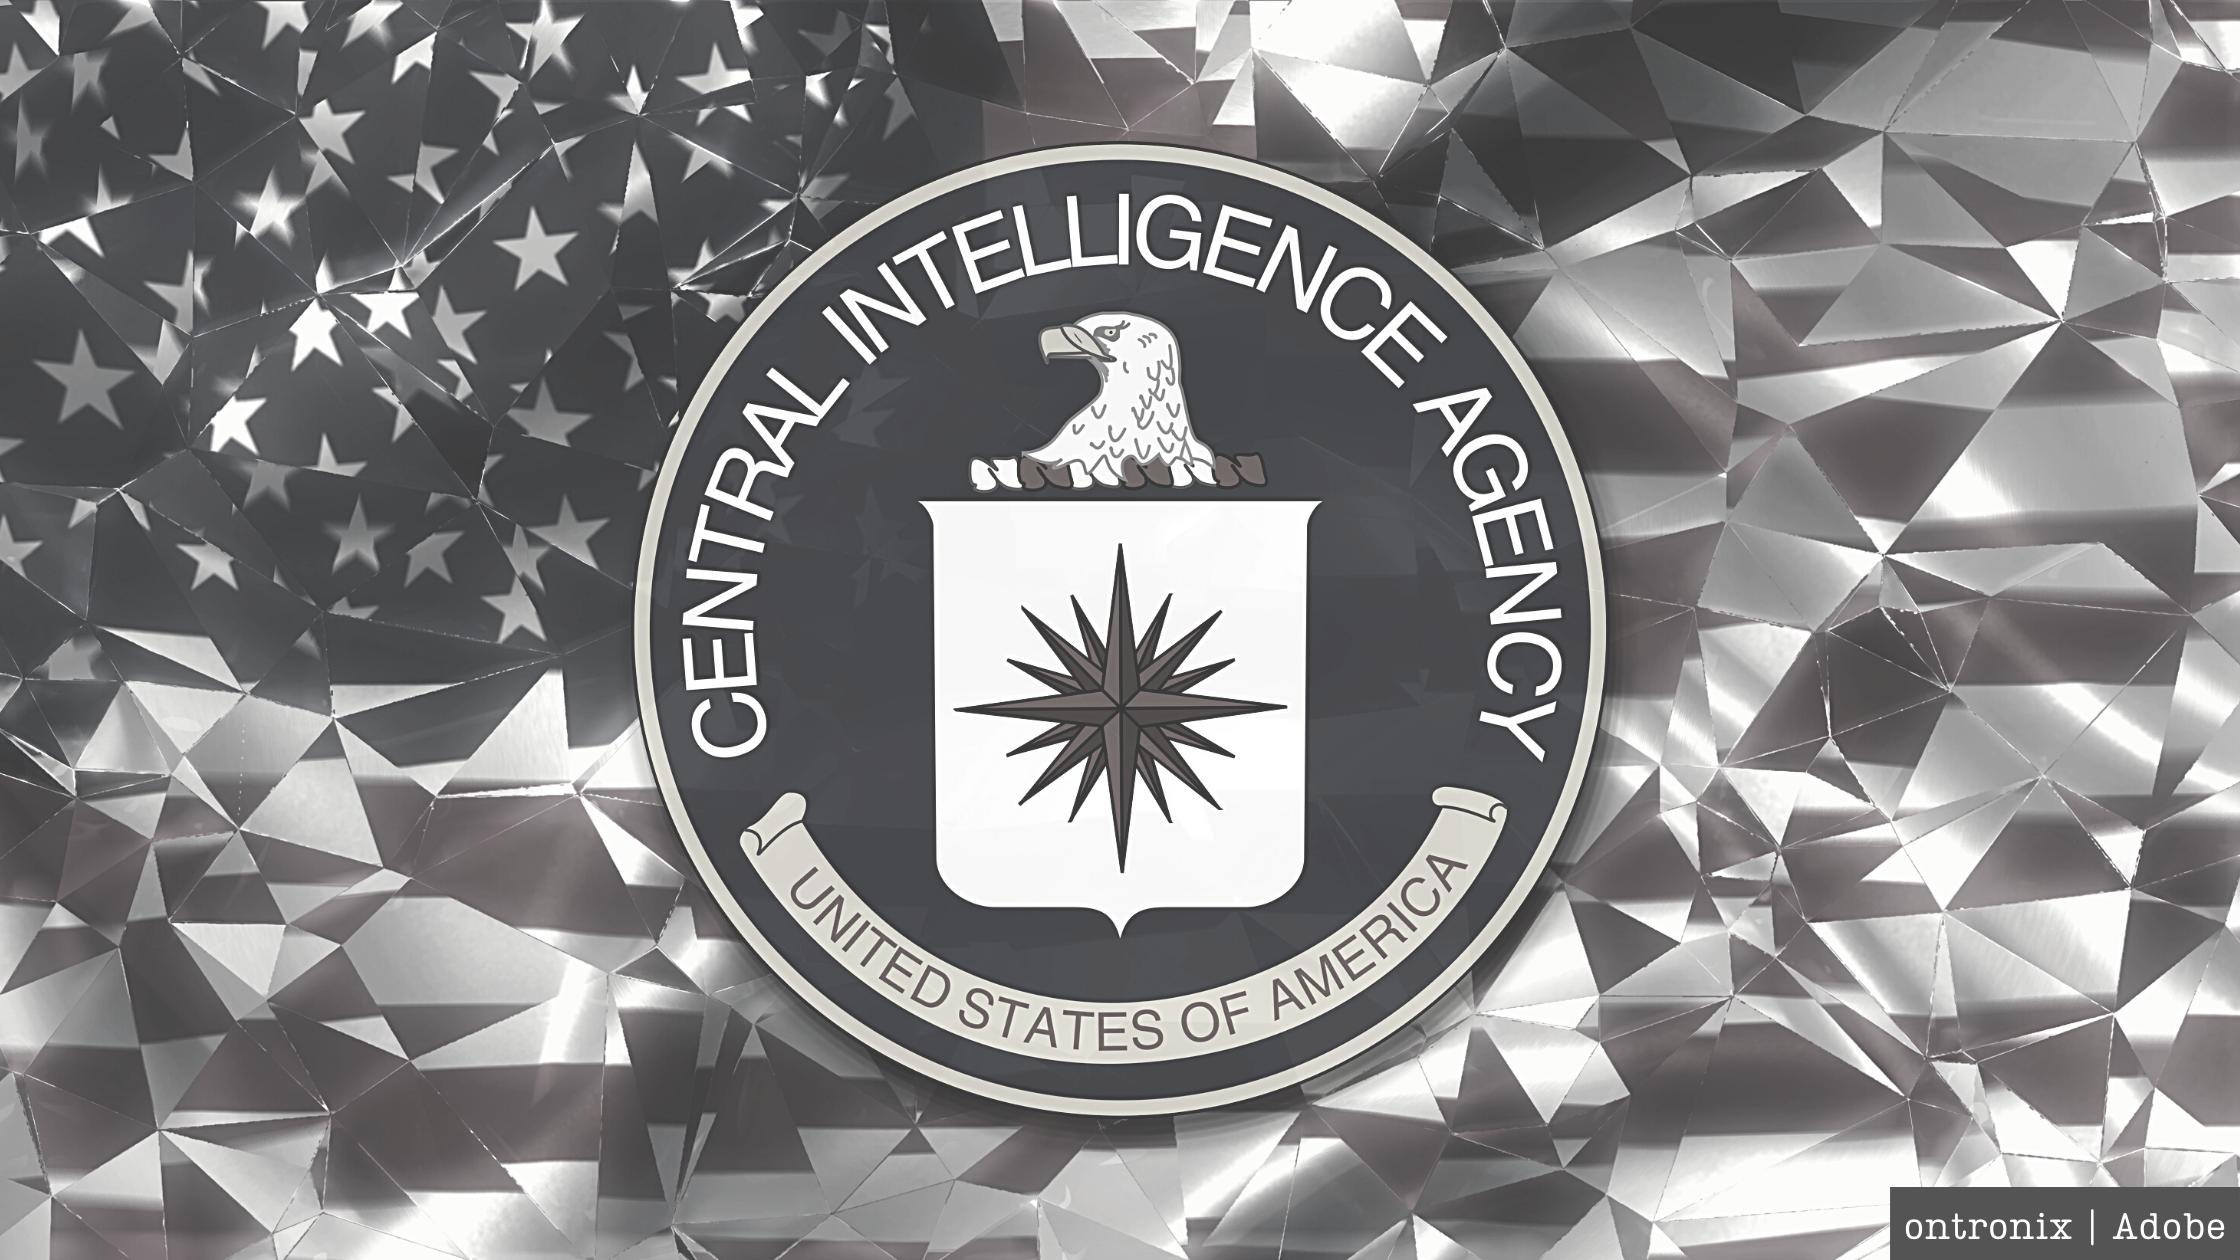 CIA Ties to Mainstream Media